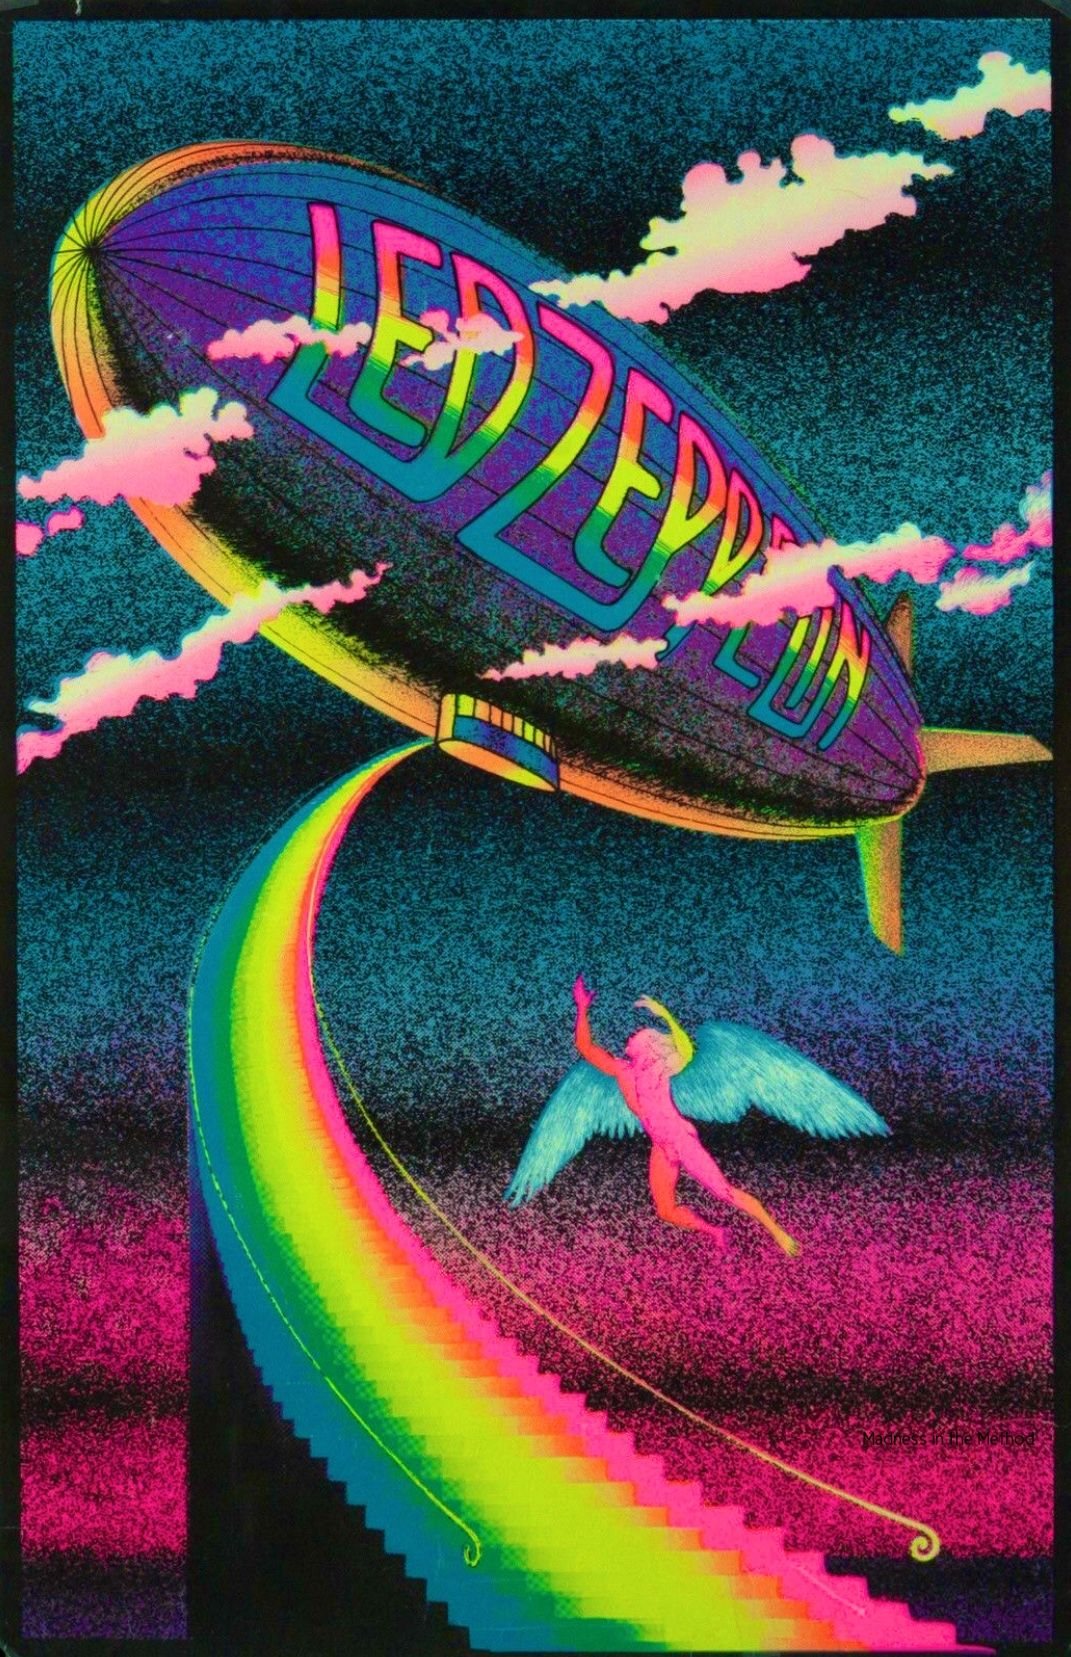 Random In 2020 Zeppelin Art Rock Band Posters Led Zeppelin Poster